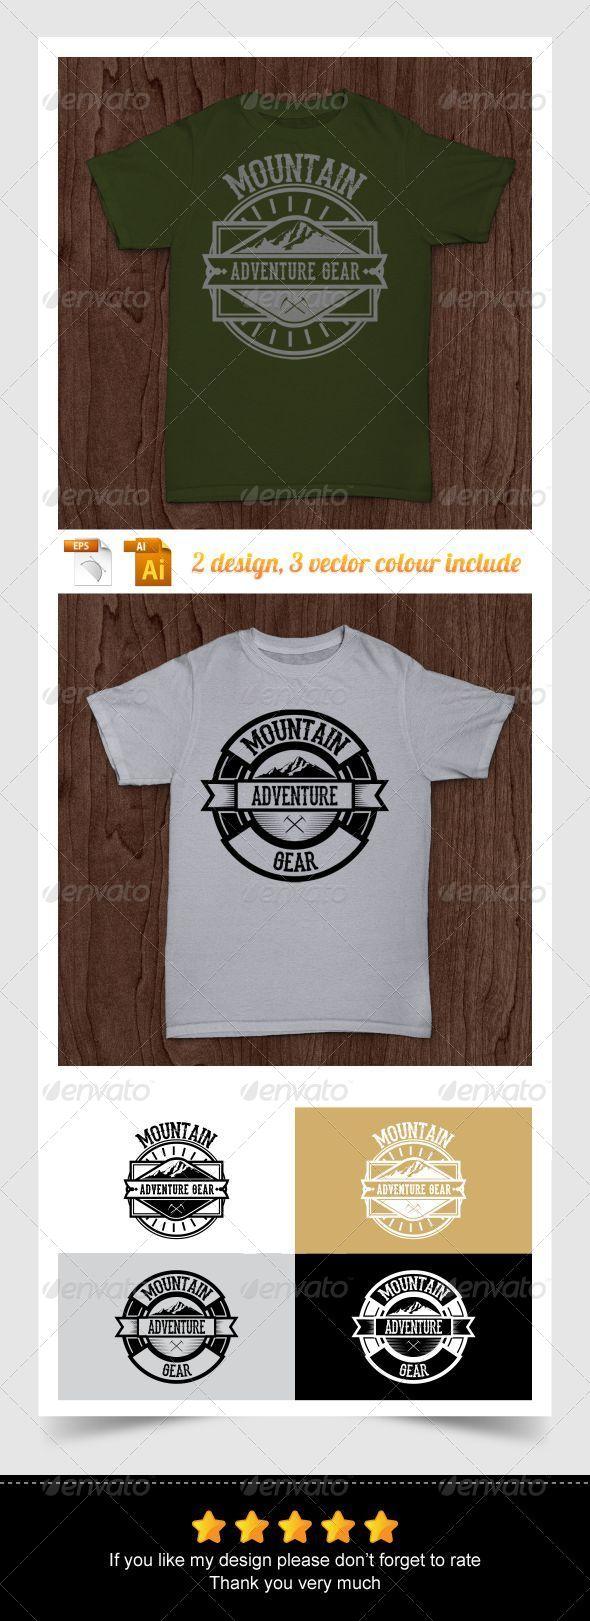 Mountain Adventure Gear - Sports & Teams T-Shirts